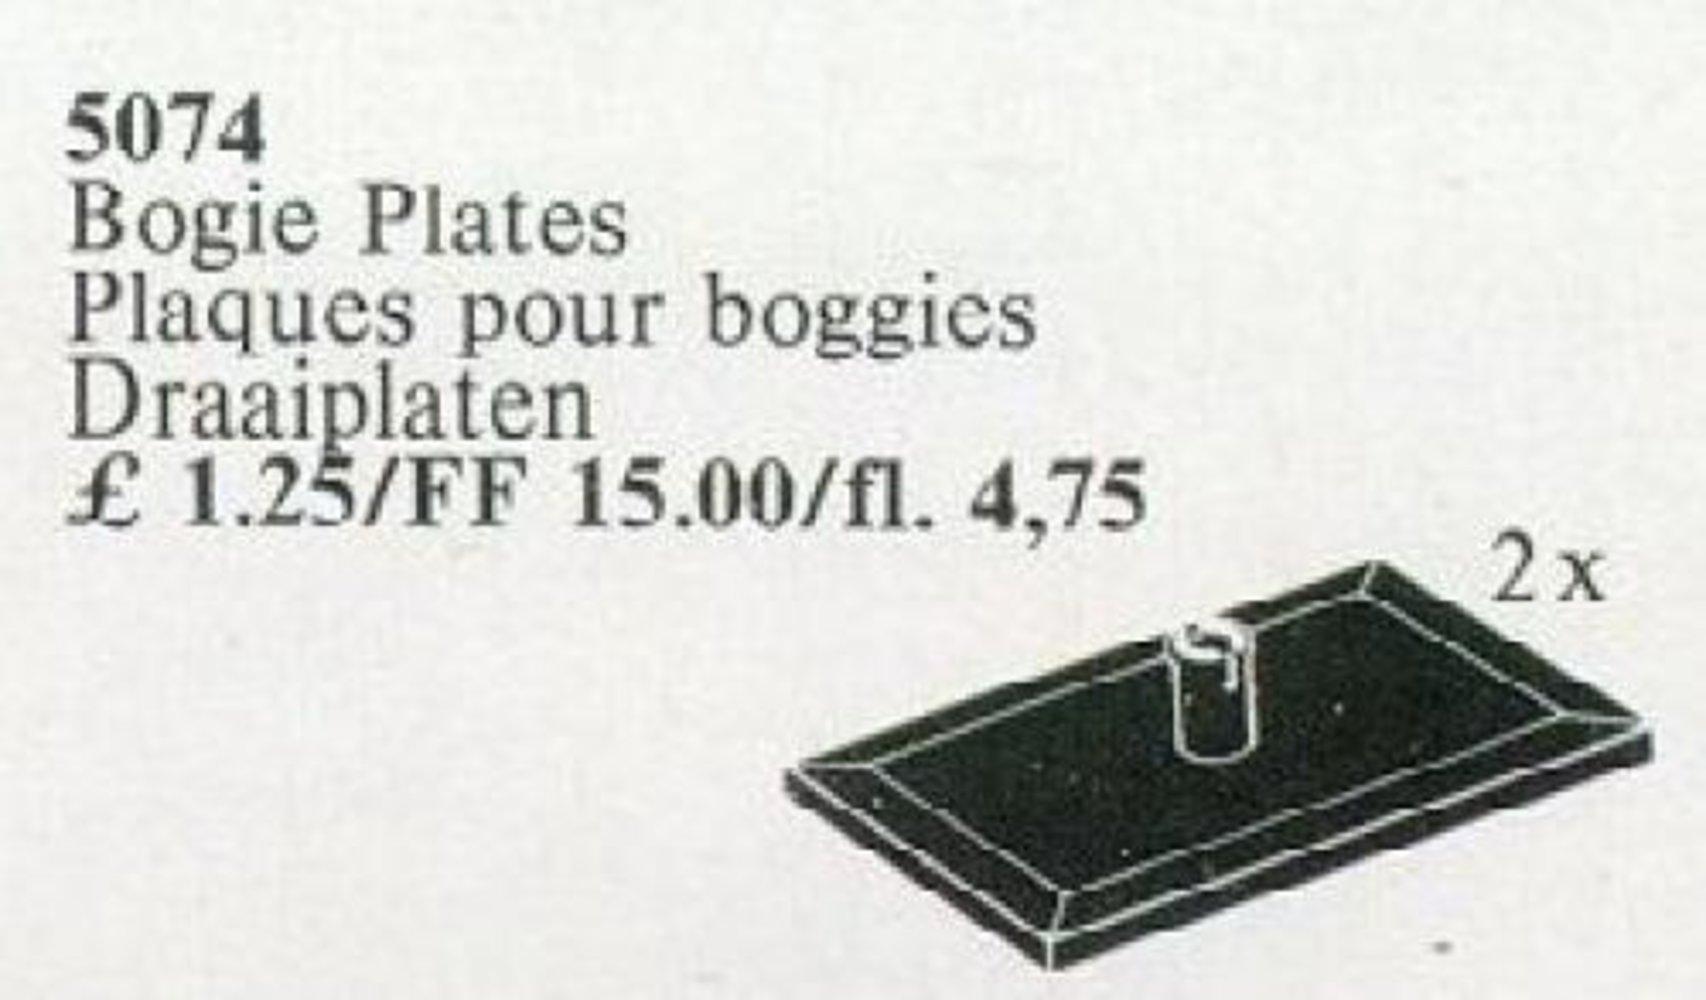 Bogie Plates, Black